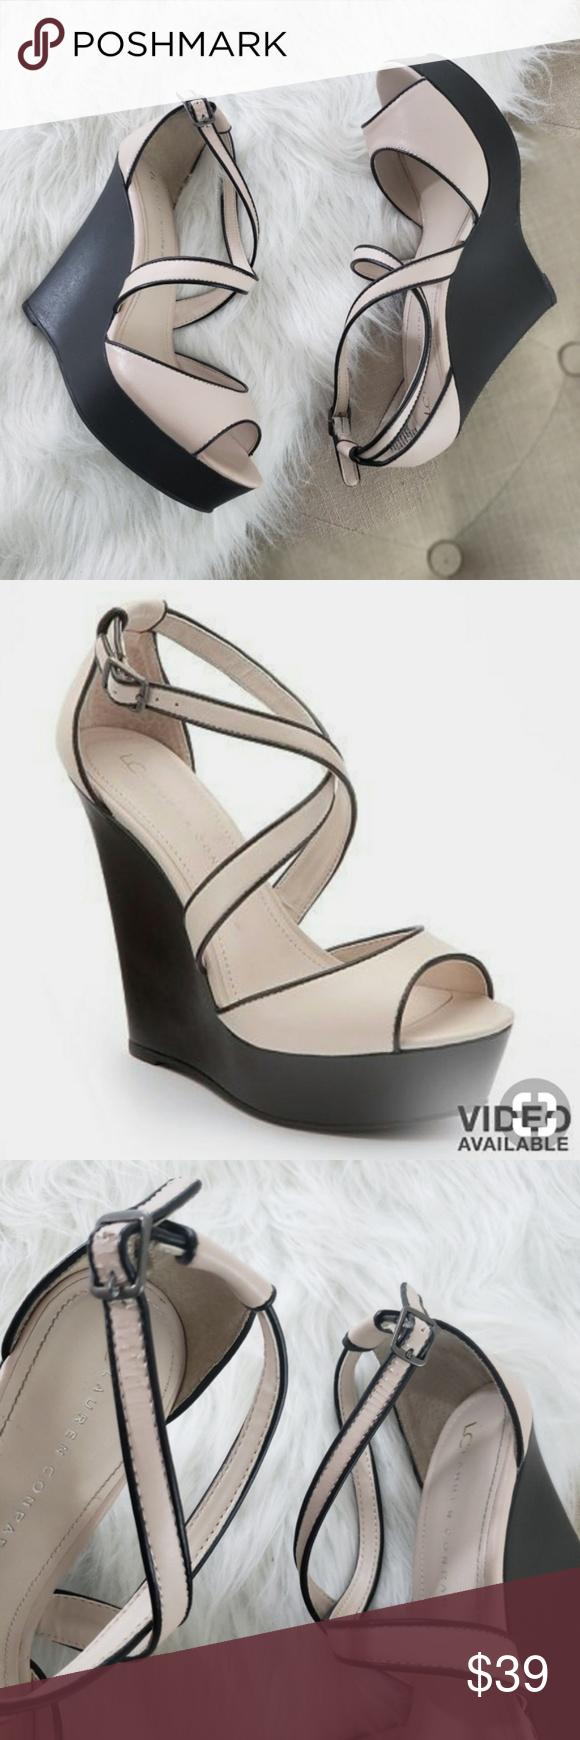 aded4d26c84b LC Lauren Conrad Strappy Wedge Heels Taupe Black LC Lauren Conrad Size 9.5  Good condition